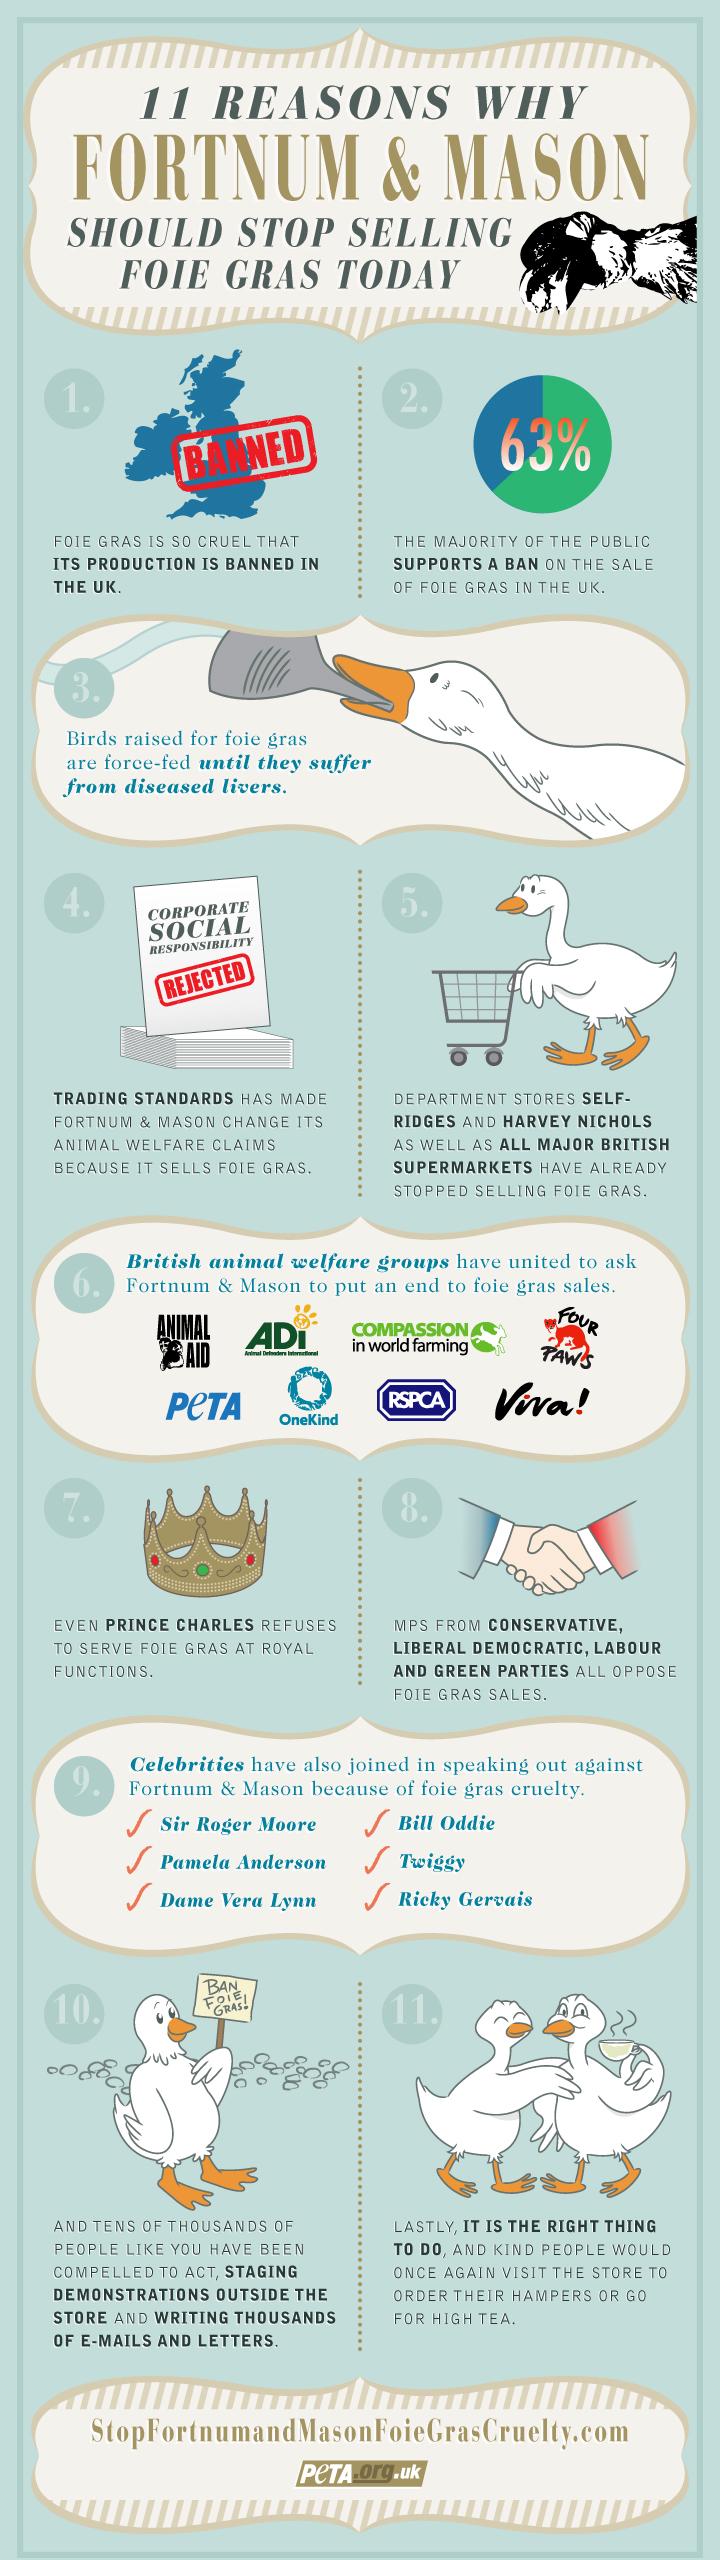 PETA Fortnum & Mason Foie Gras Infographic